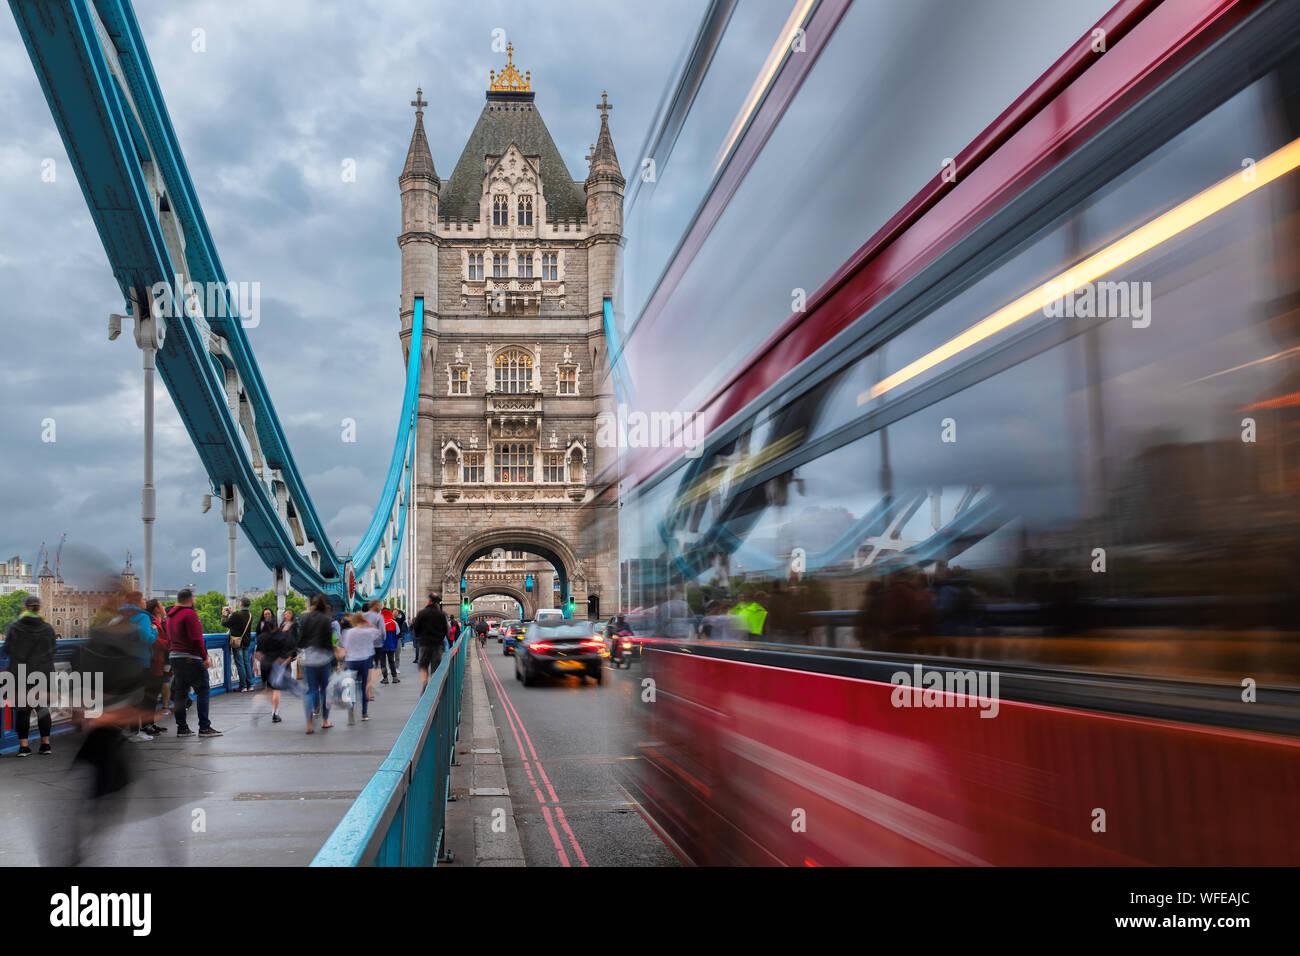 Tower Bridge in London UK Stock Photo